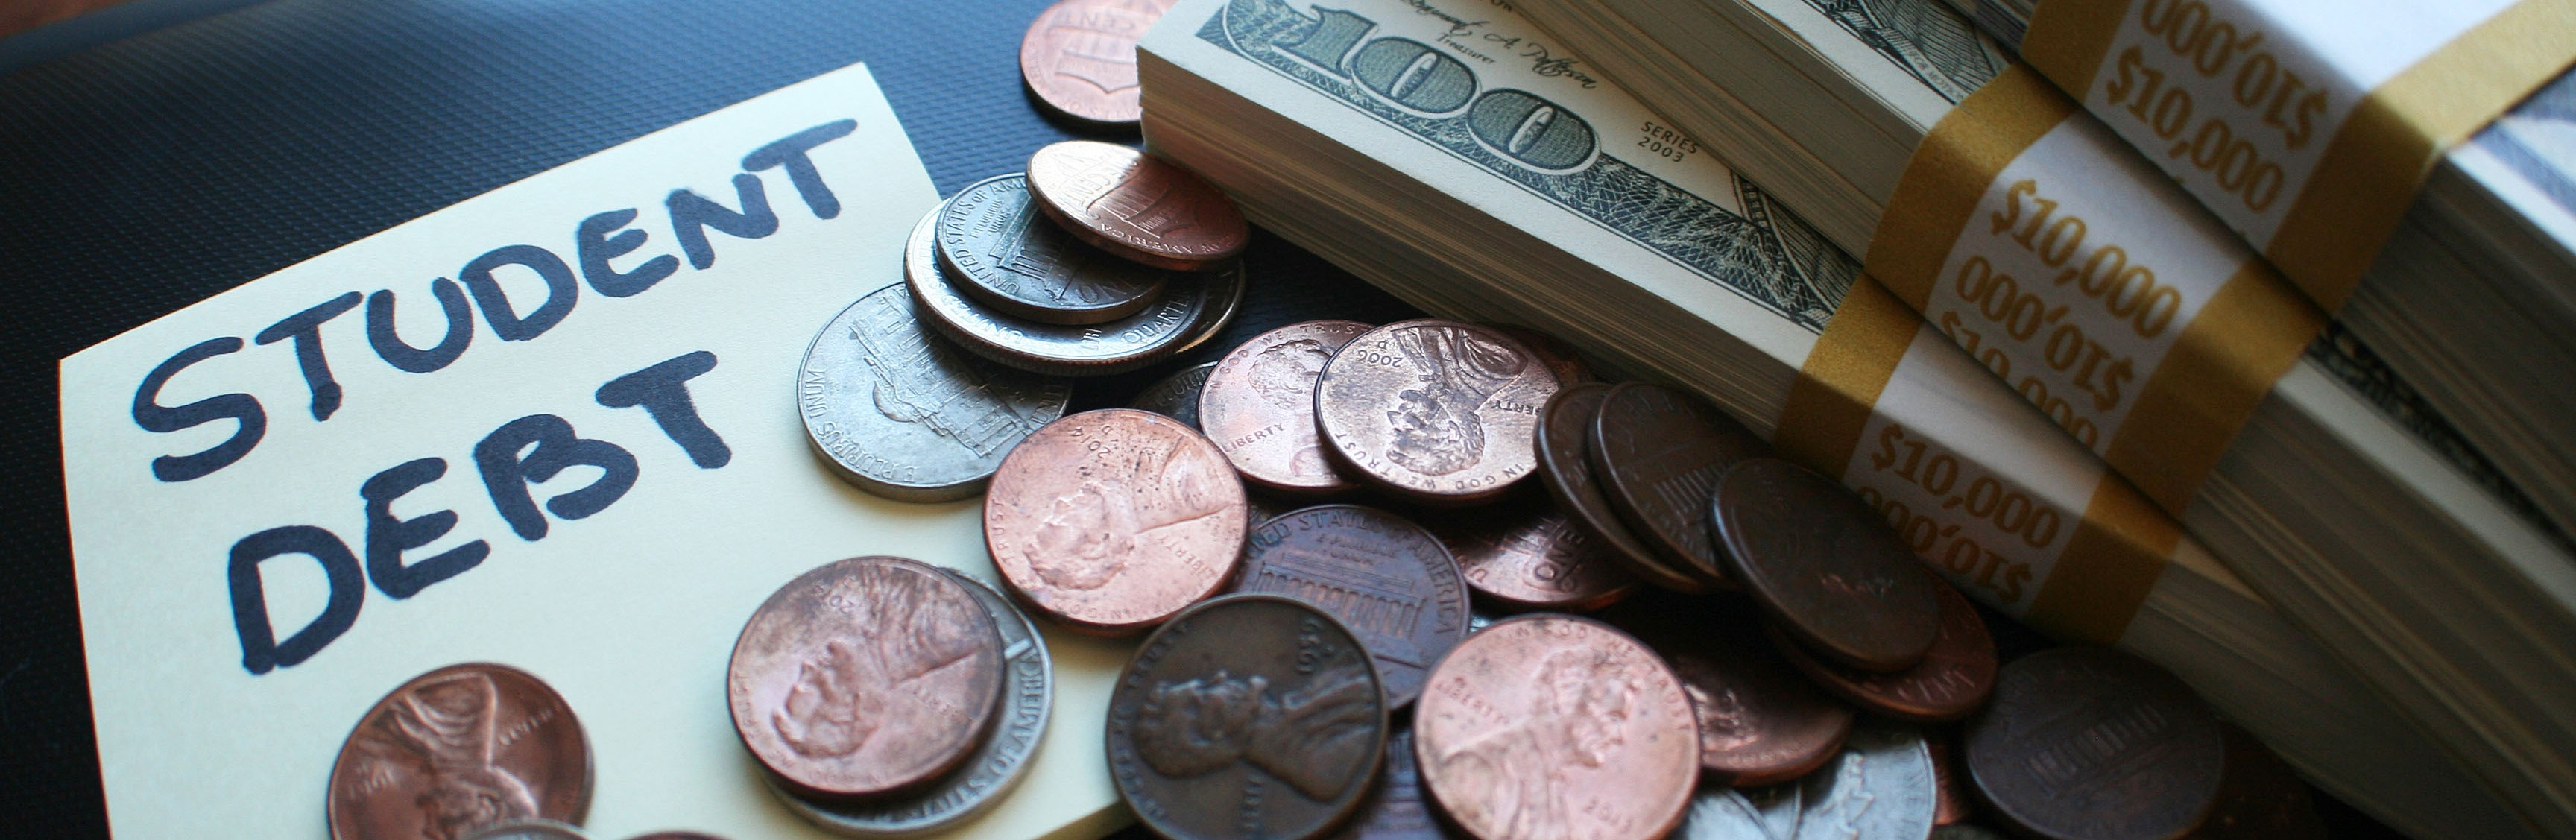 money saving debt